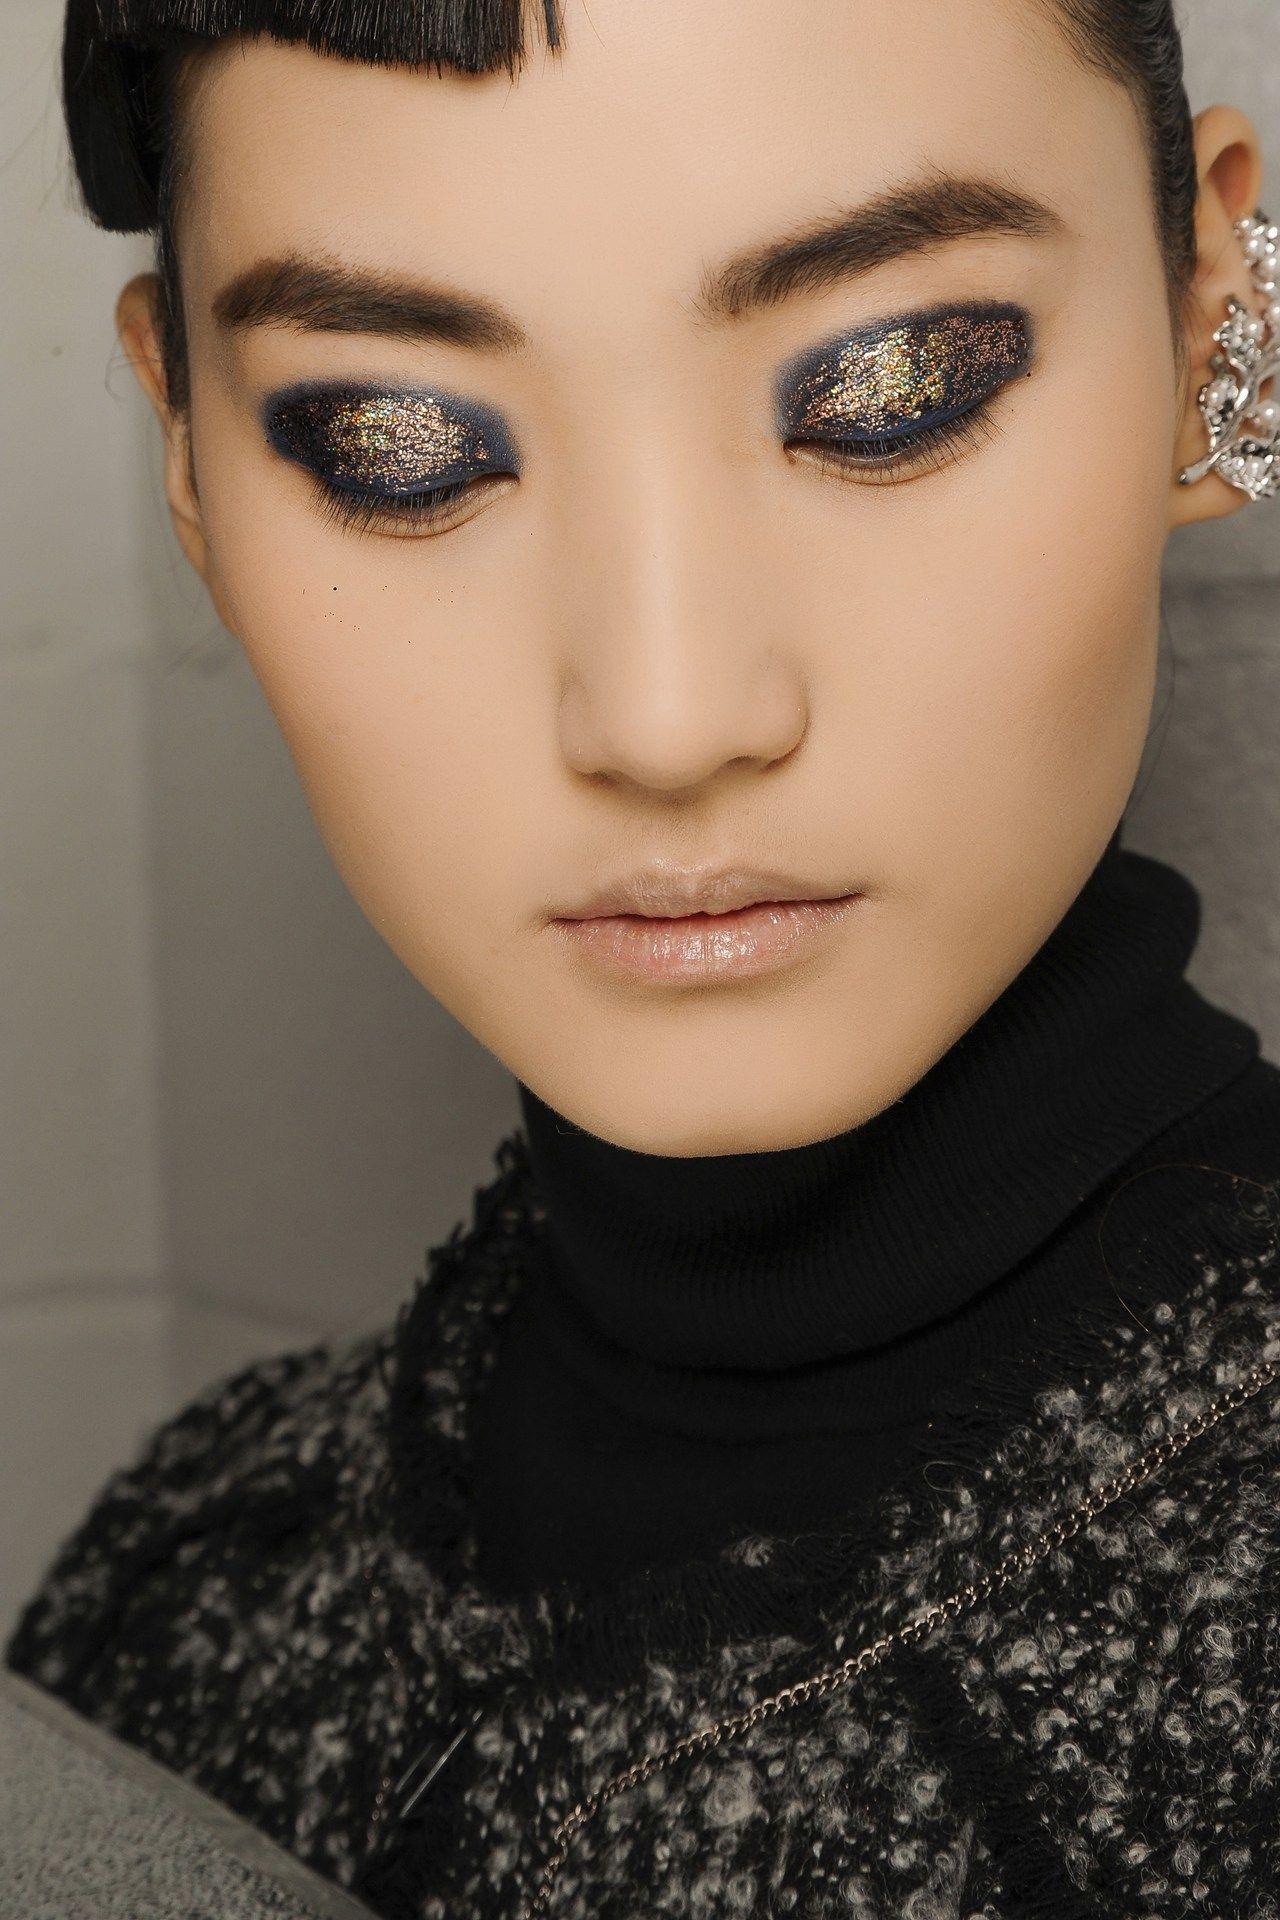 Backstage Beauty Autumn/Winter 201314 Asian makeup